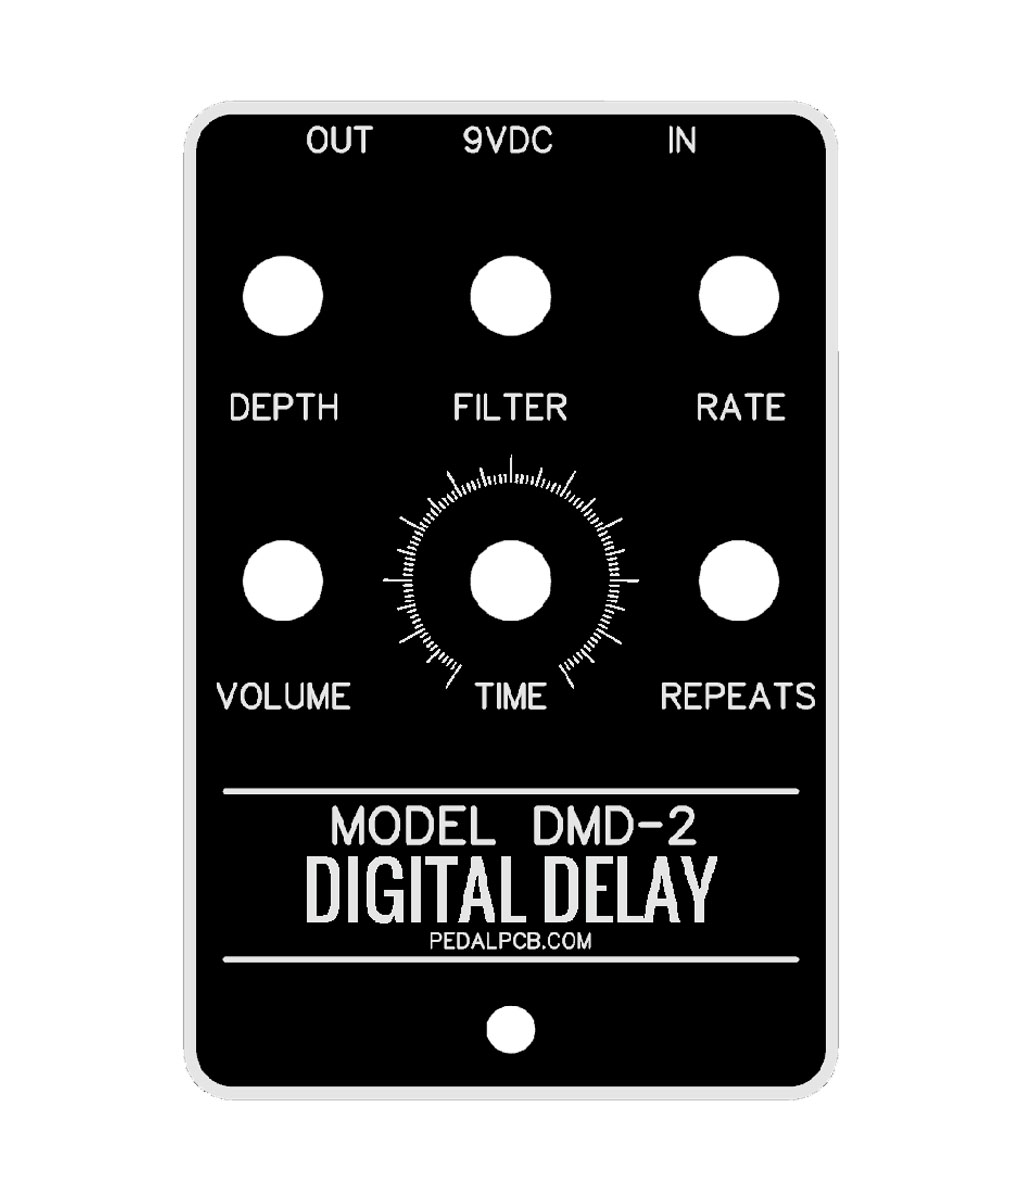 DMD-2 Faceplate